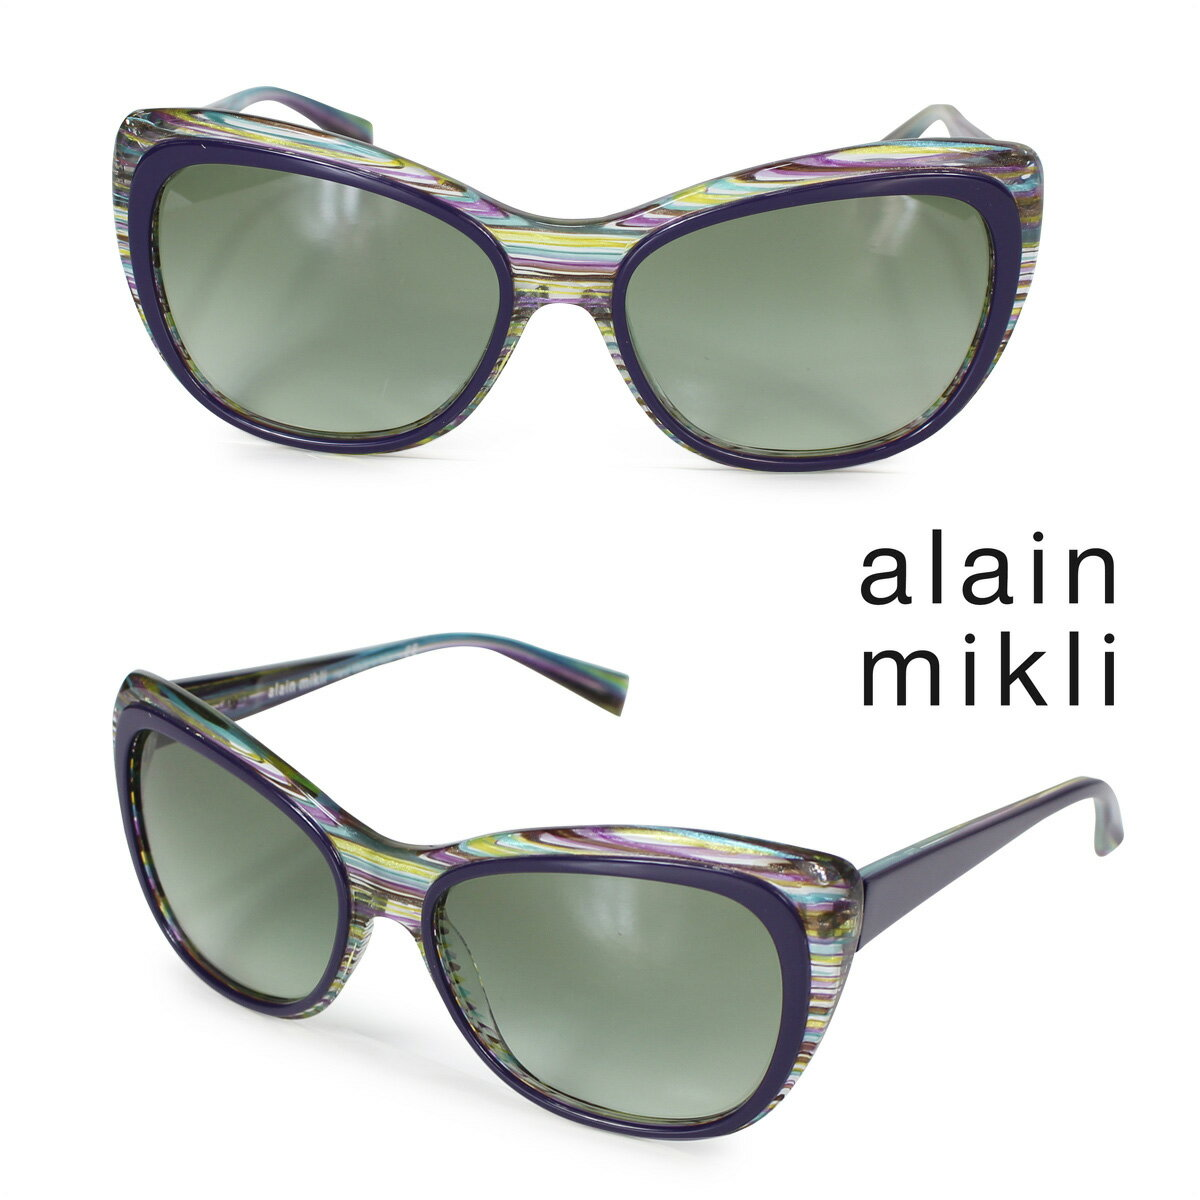 alain mikli サングラス メガネ アランミクリ メガネフレーム 眼鏡 イタリア製 メンズ レディース